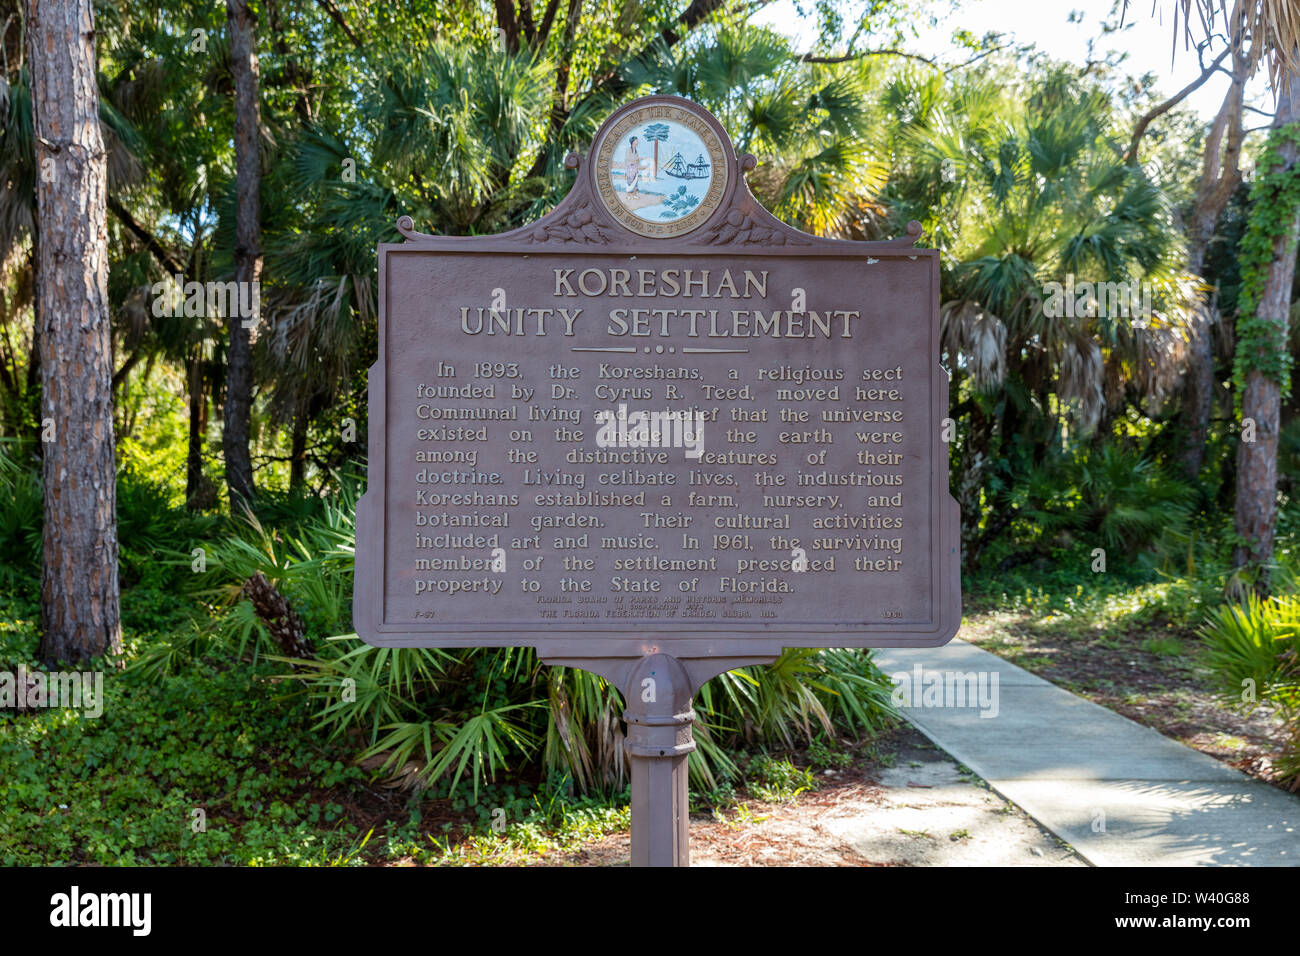 Marcador descripción por motivos de Koreshan arreglo histórico - un siglo xix comuna utópica, Estero, Florida, EE.UU. Foto de stock